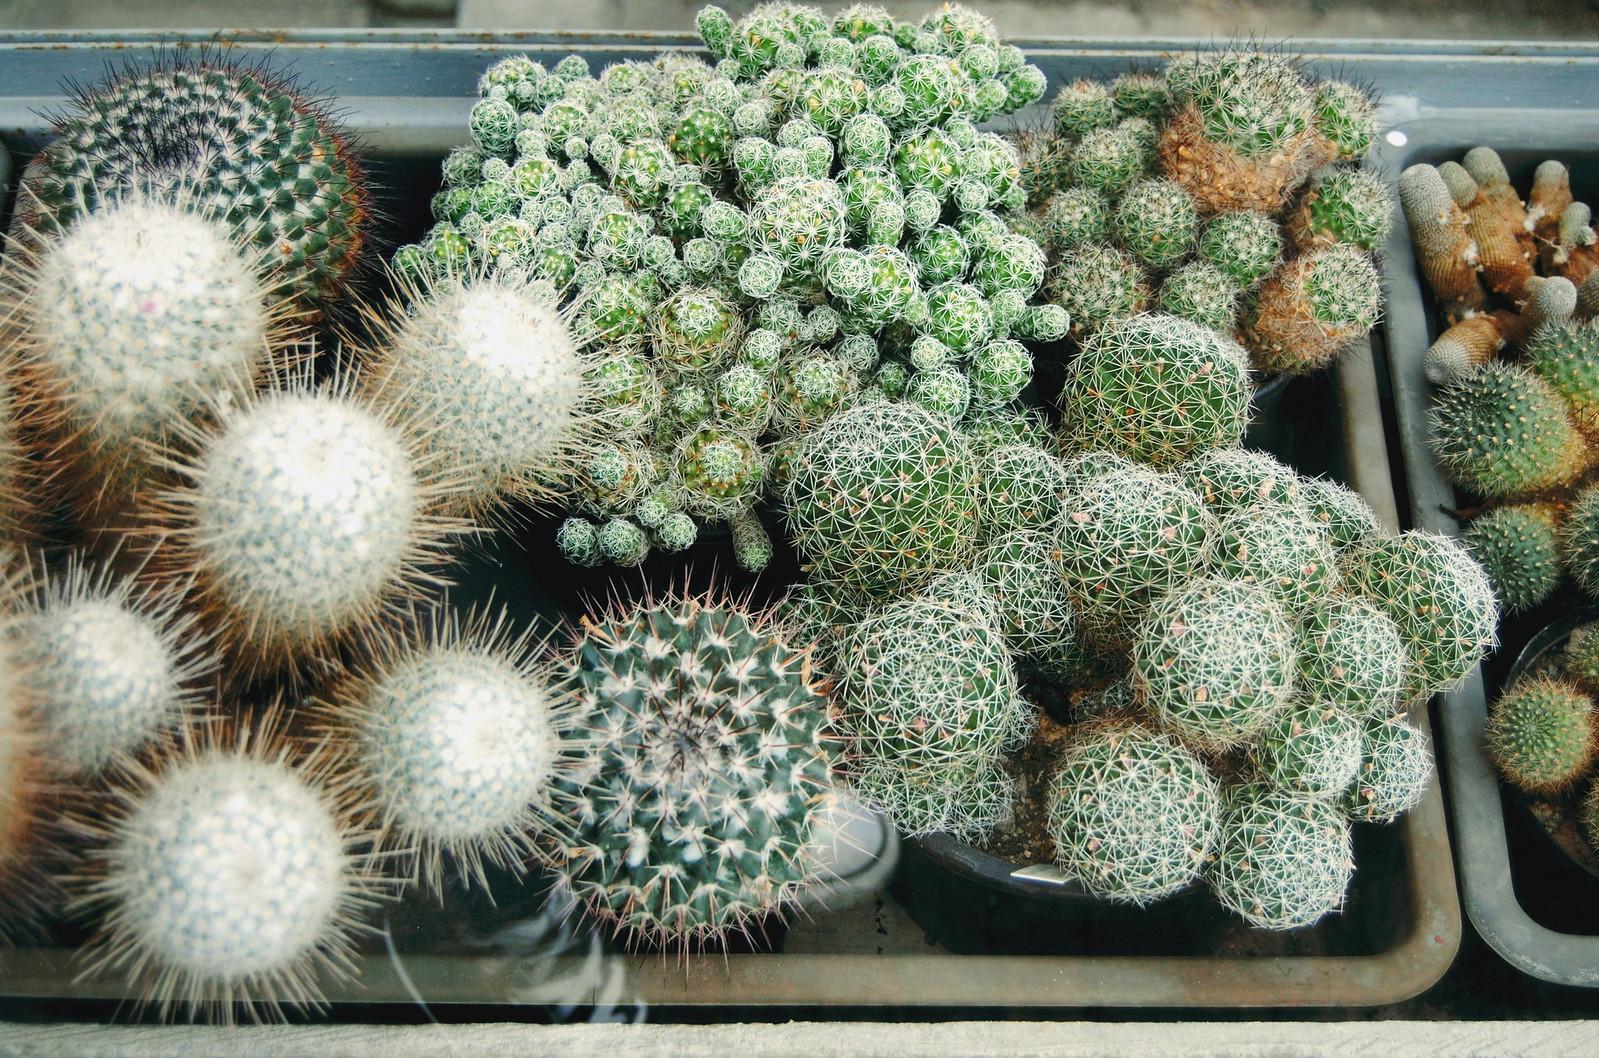 Cacti in the Botanical Garden of Antwerp